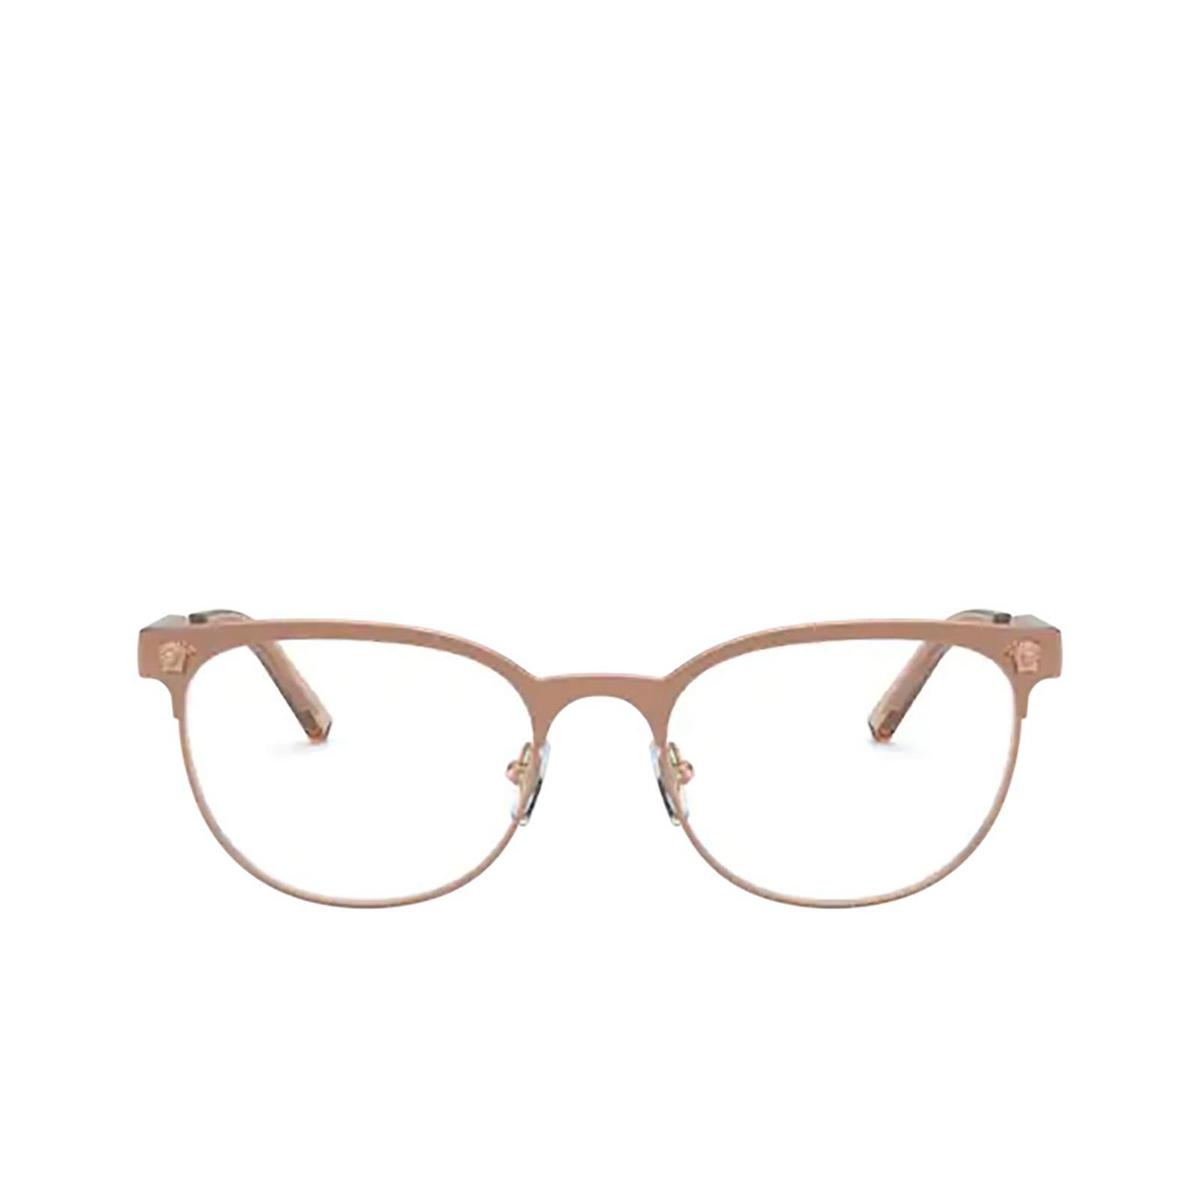 Versace® Oval Eyeglasses: VE1268 color Pink Gold 1412 - front view.